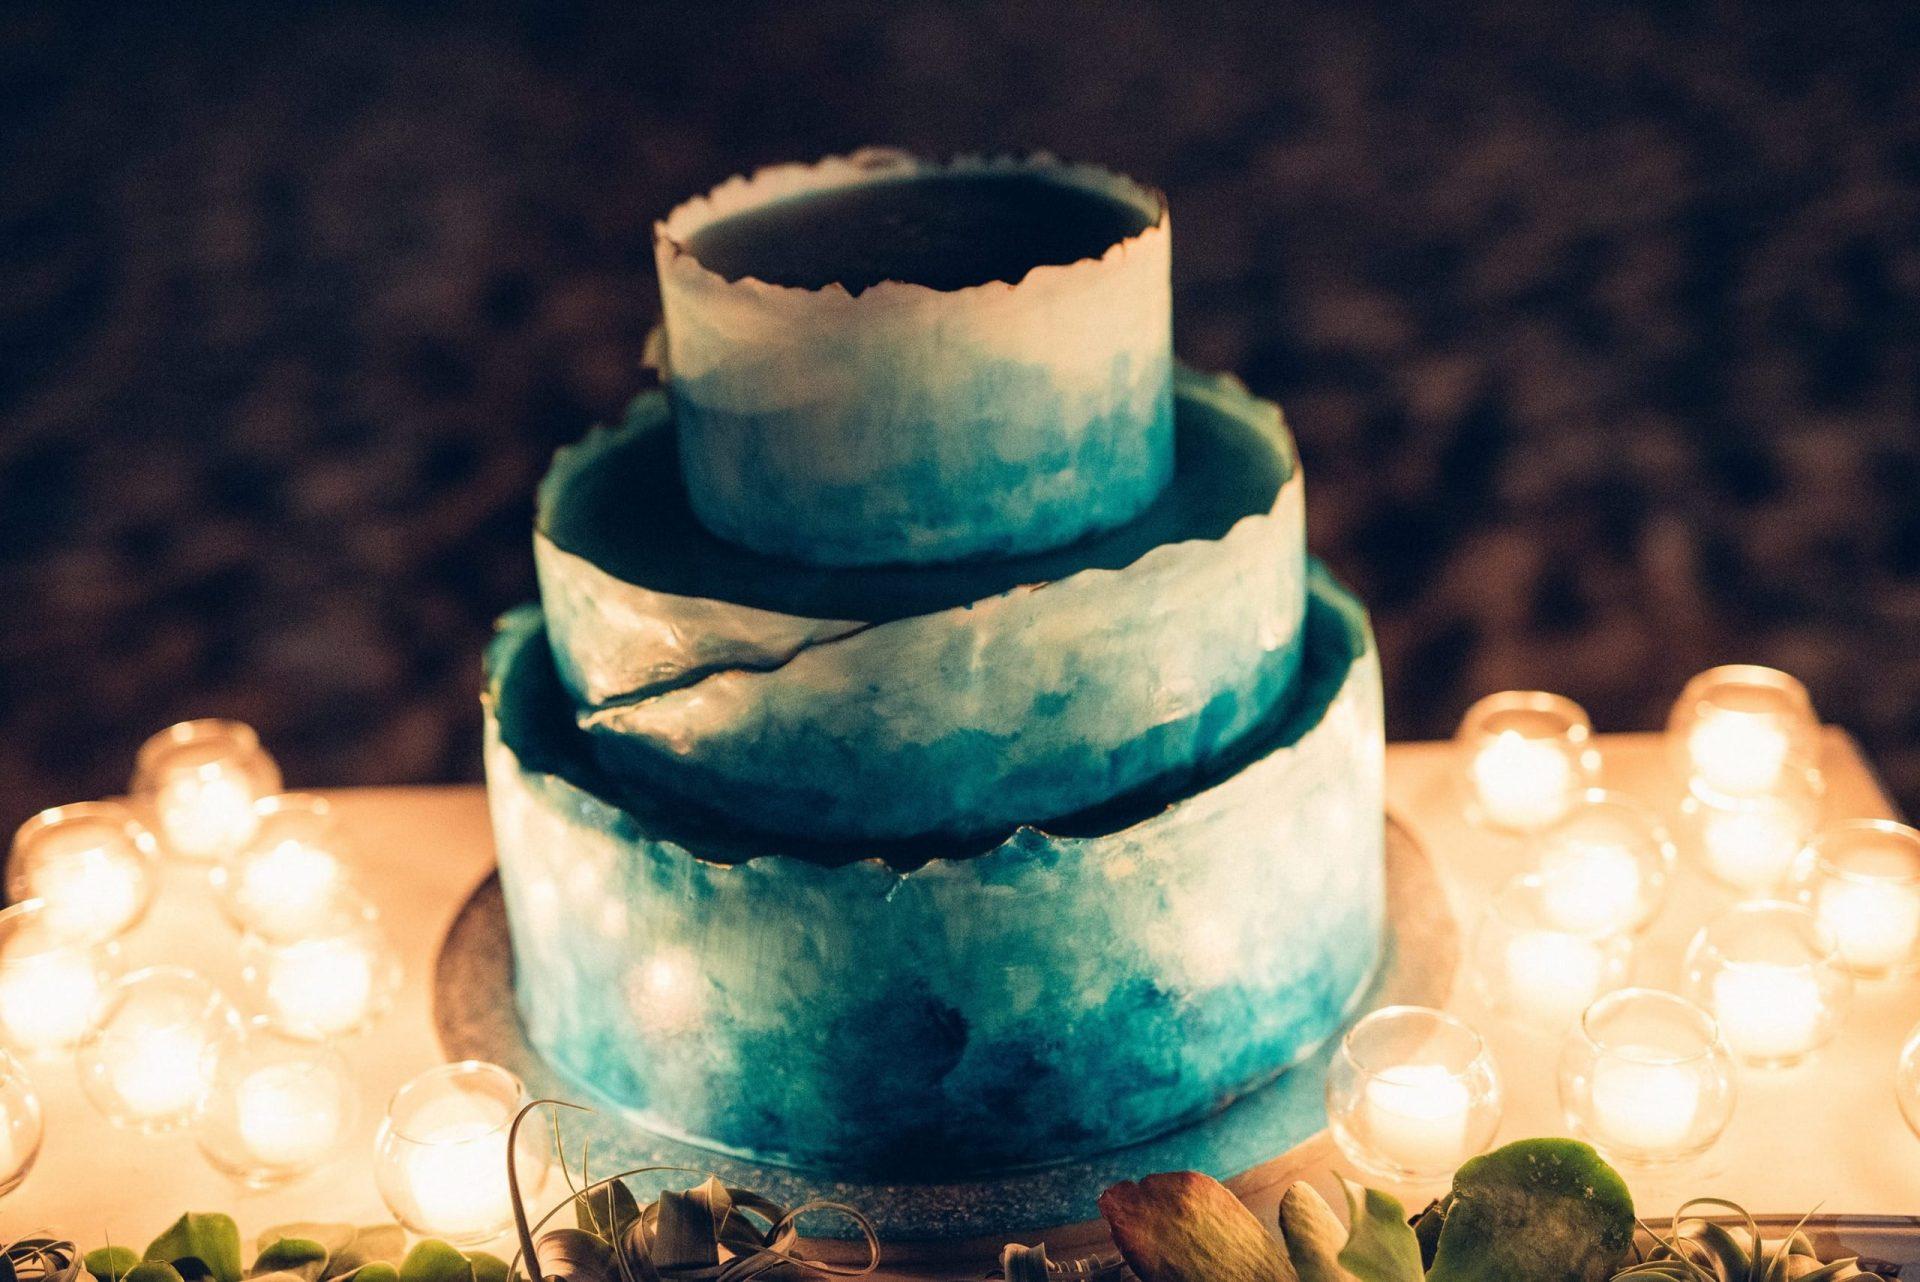 Mario and Mery, wedding cake